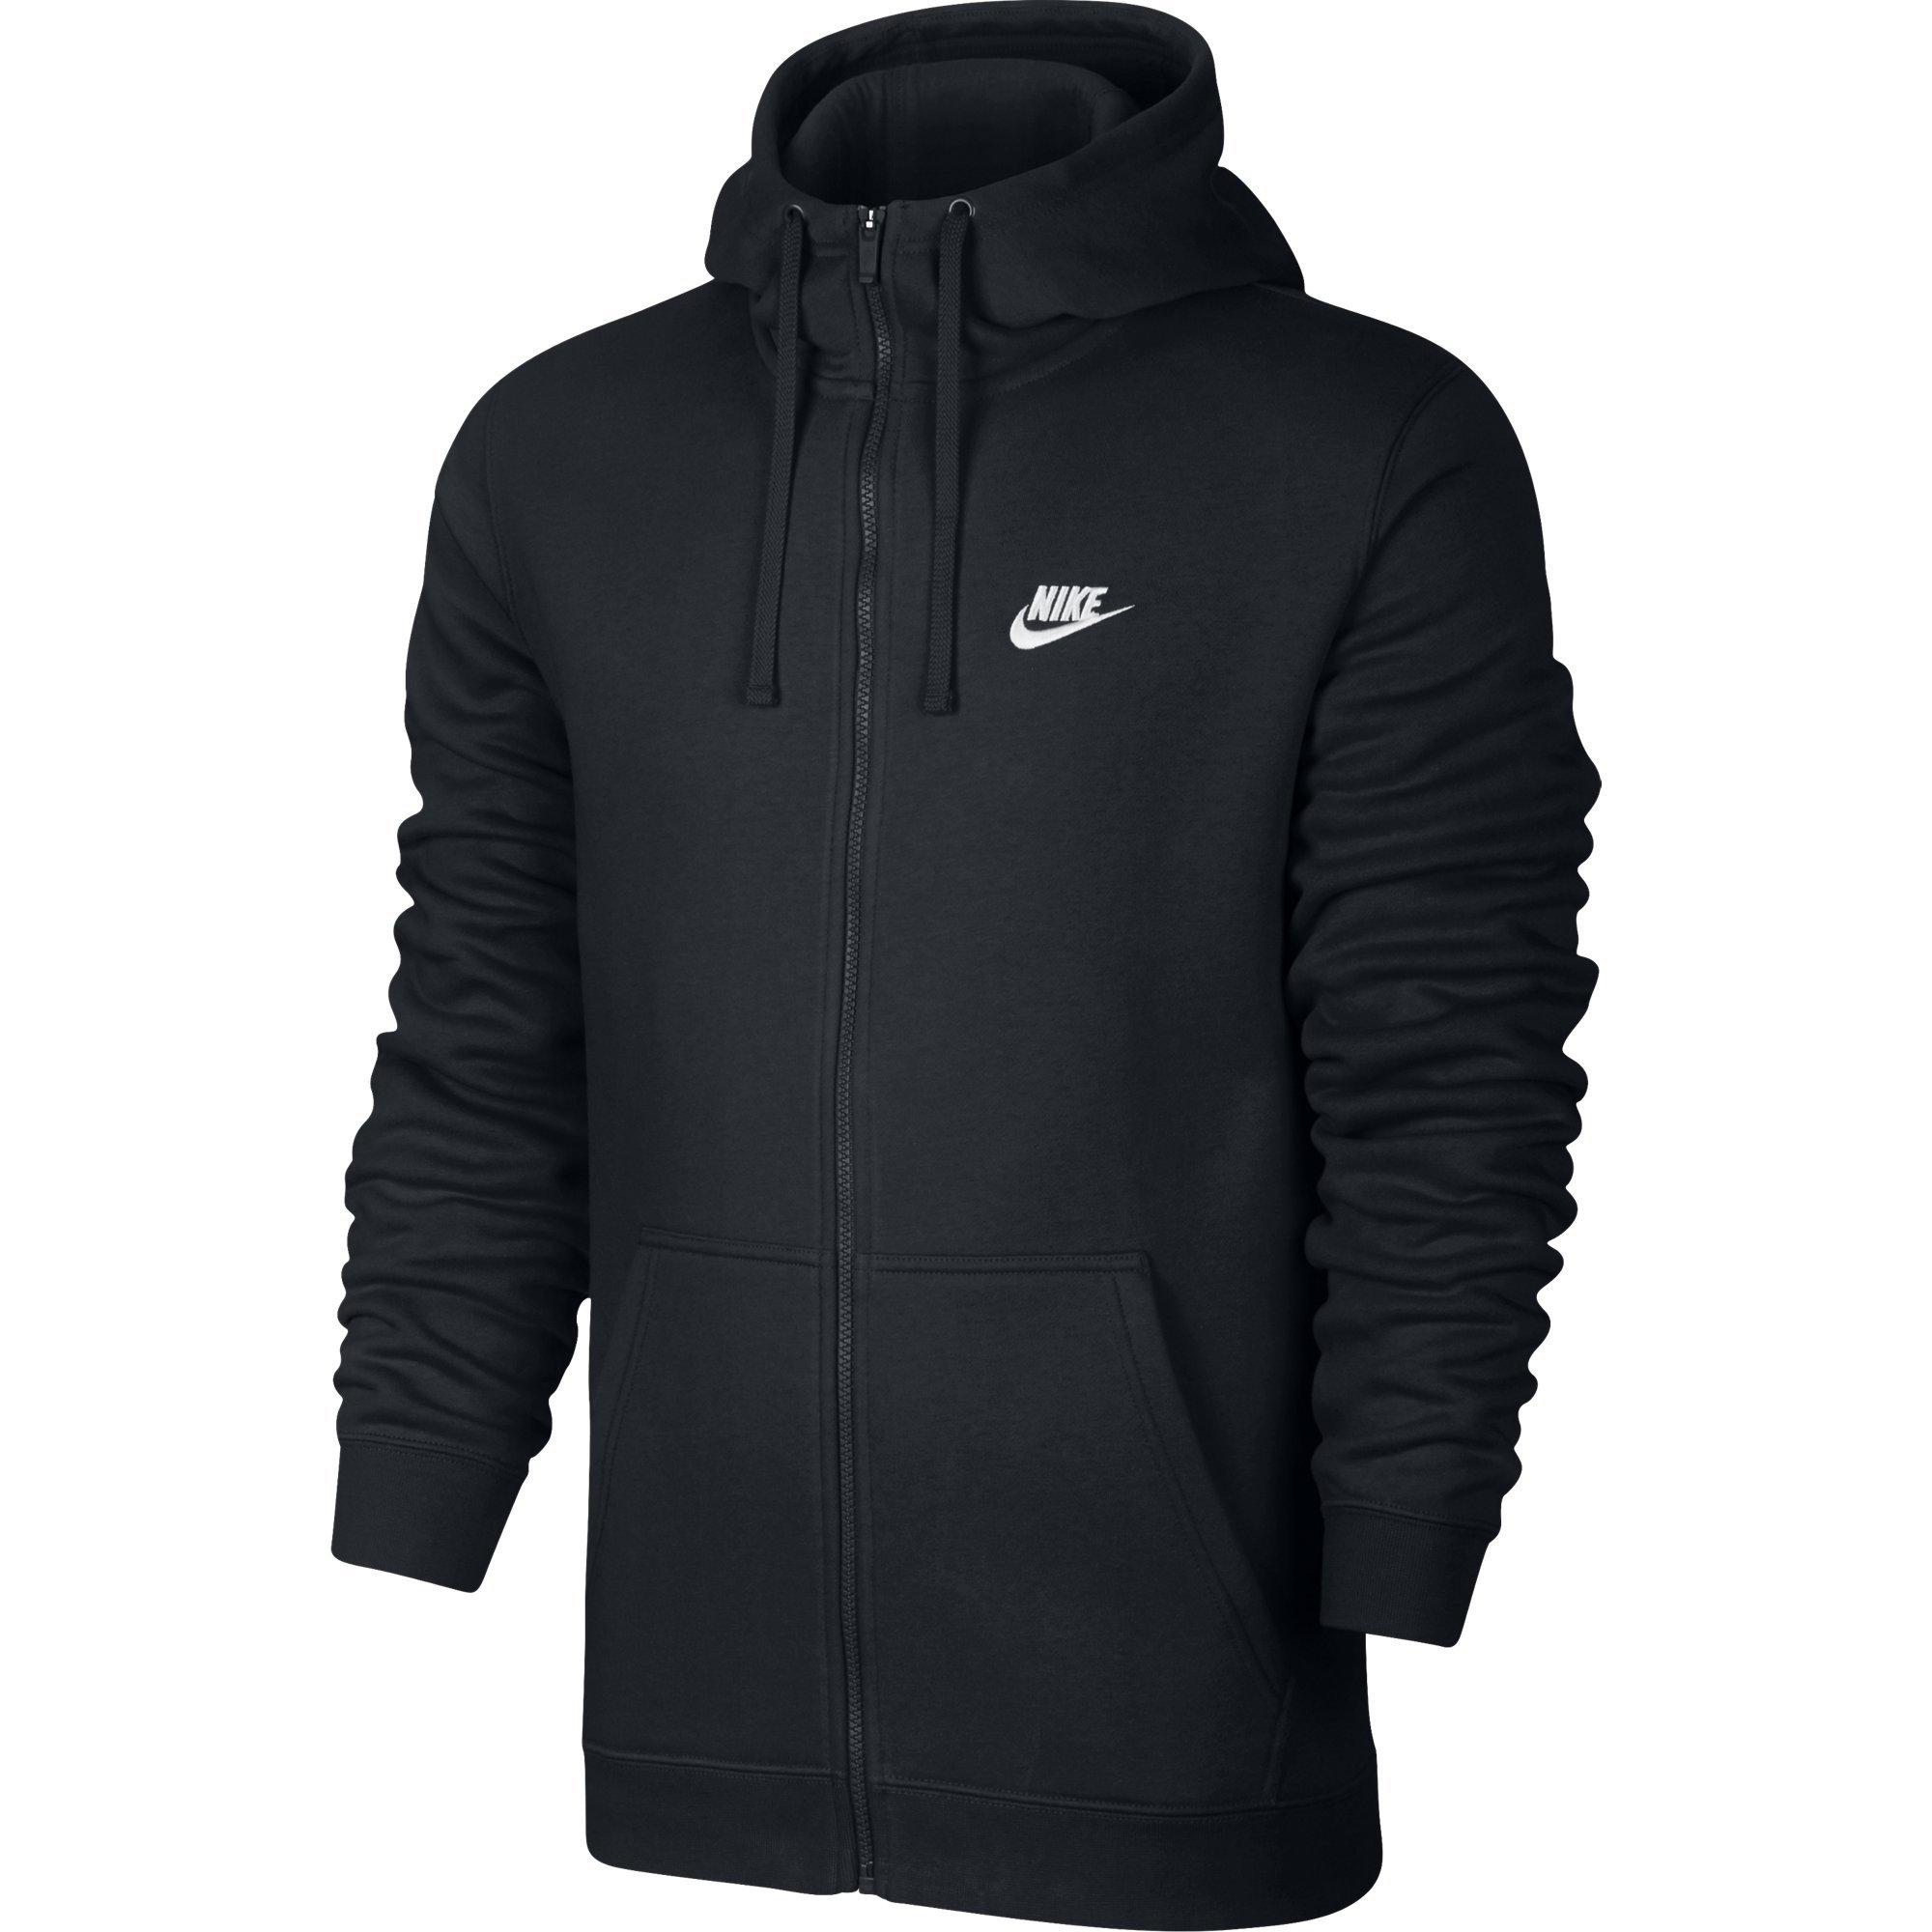 NIKE Sportswear Men's Full Zip Club Hoodie, Black/Black/White, X-Large